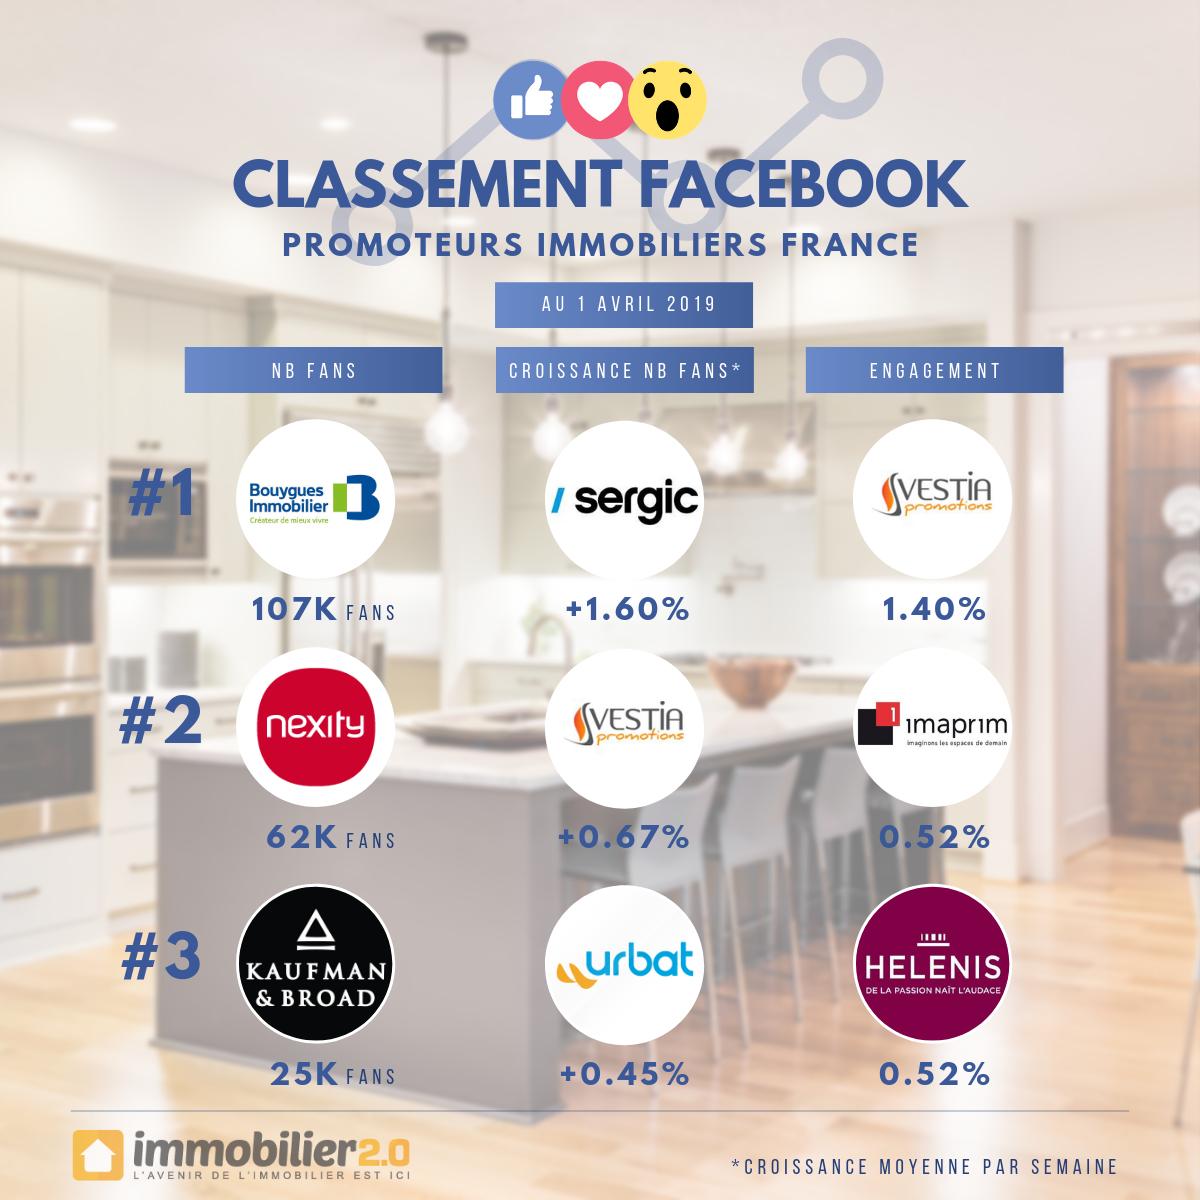 Classement Facebook Promoteurs Immobiliers France Avril 2019